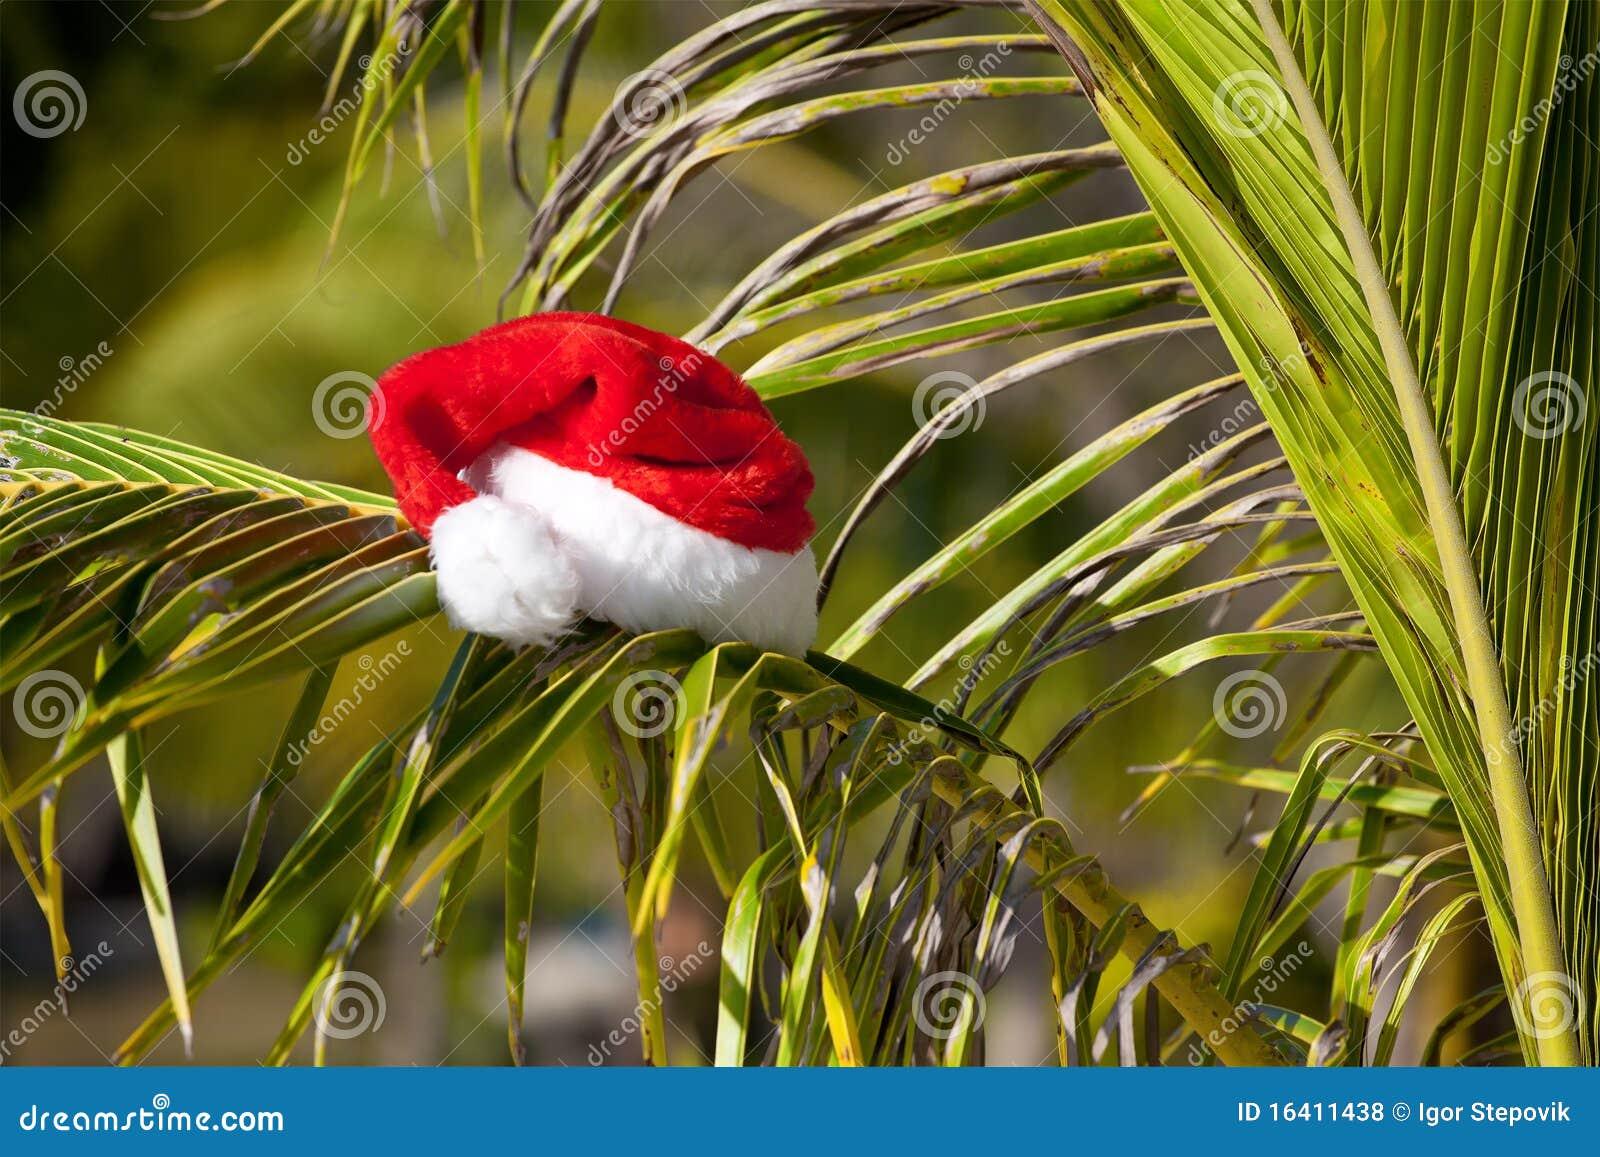 Red Santa s hat hanging on palm tree